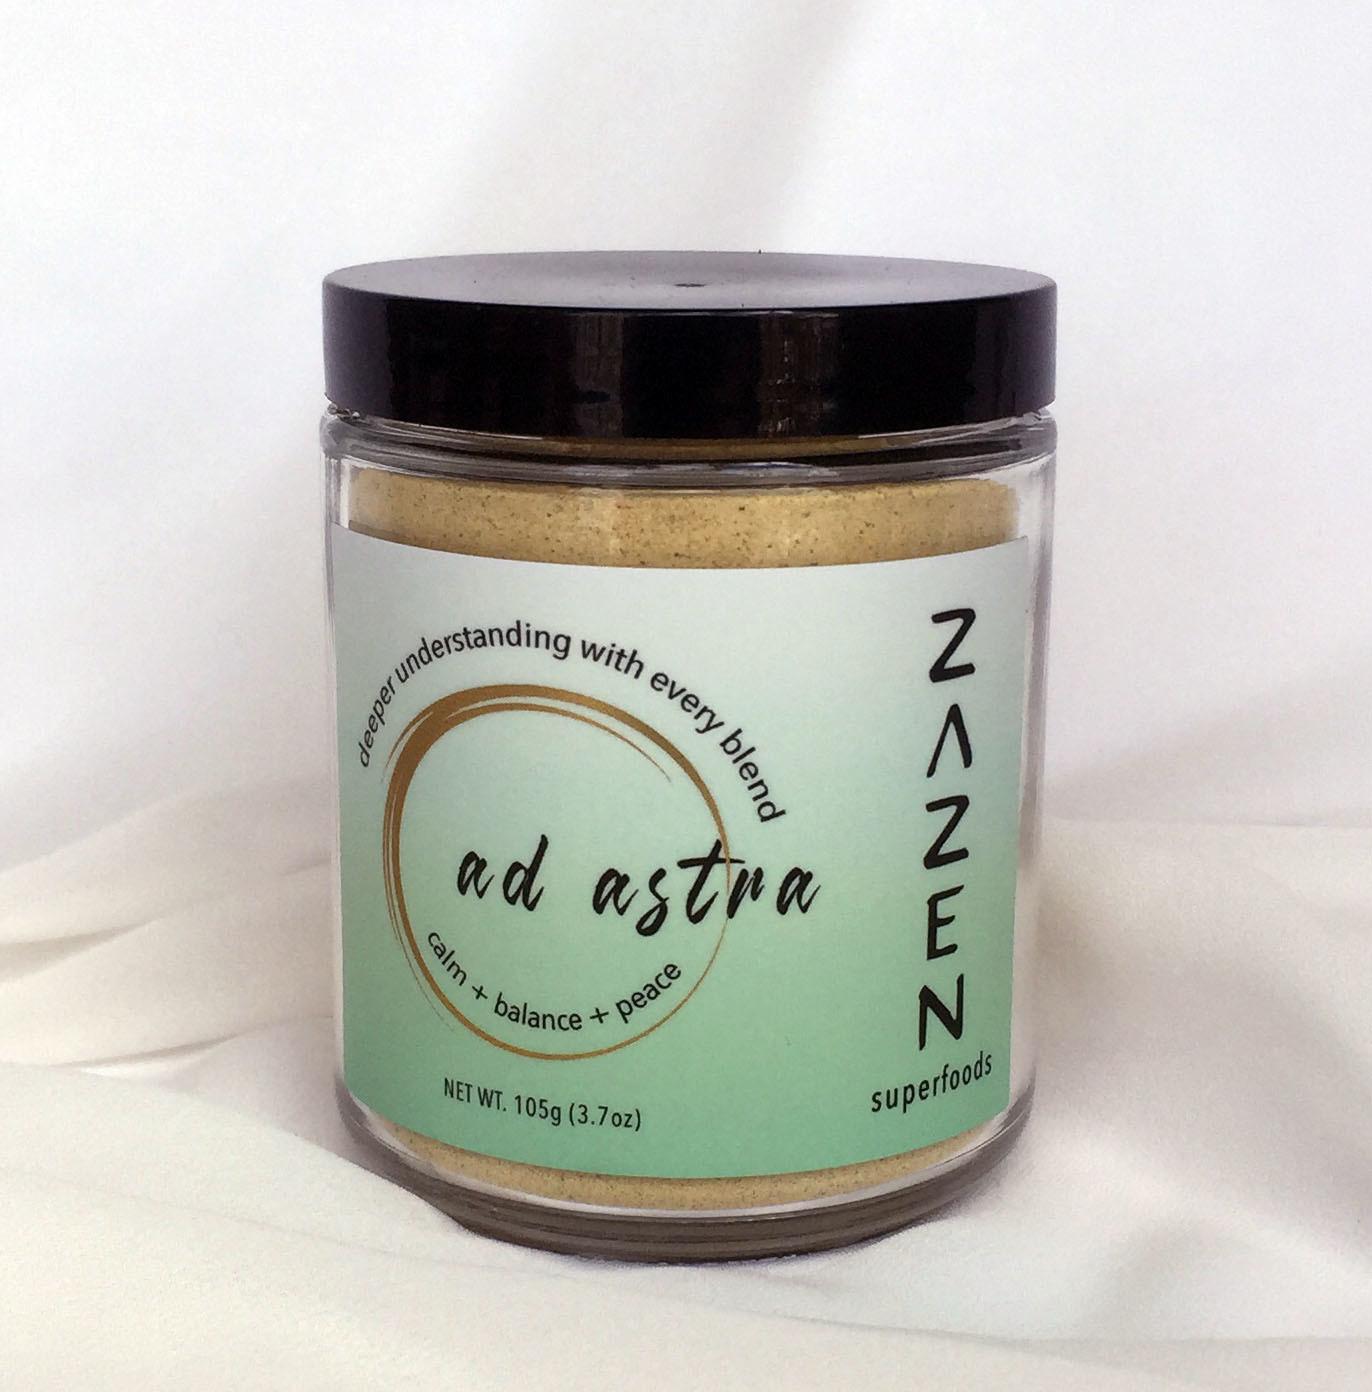 Zazen Super Blend: Ad Astra